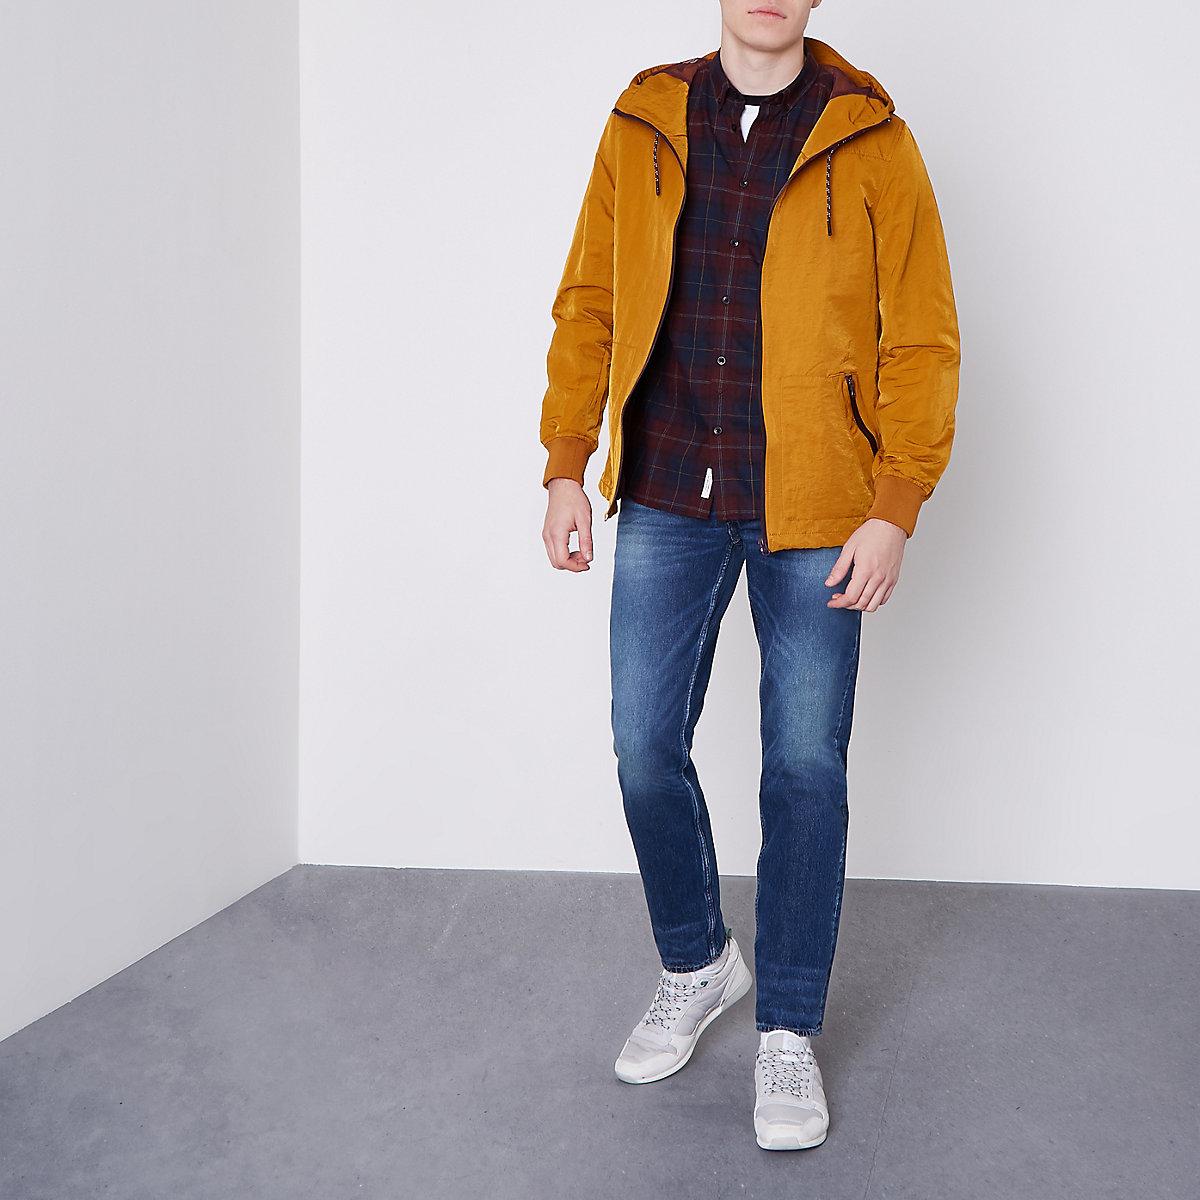 Mustard yellow nylon hooded jacket